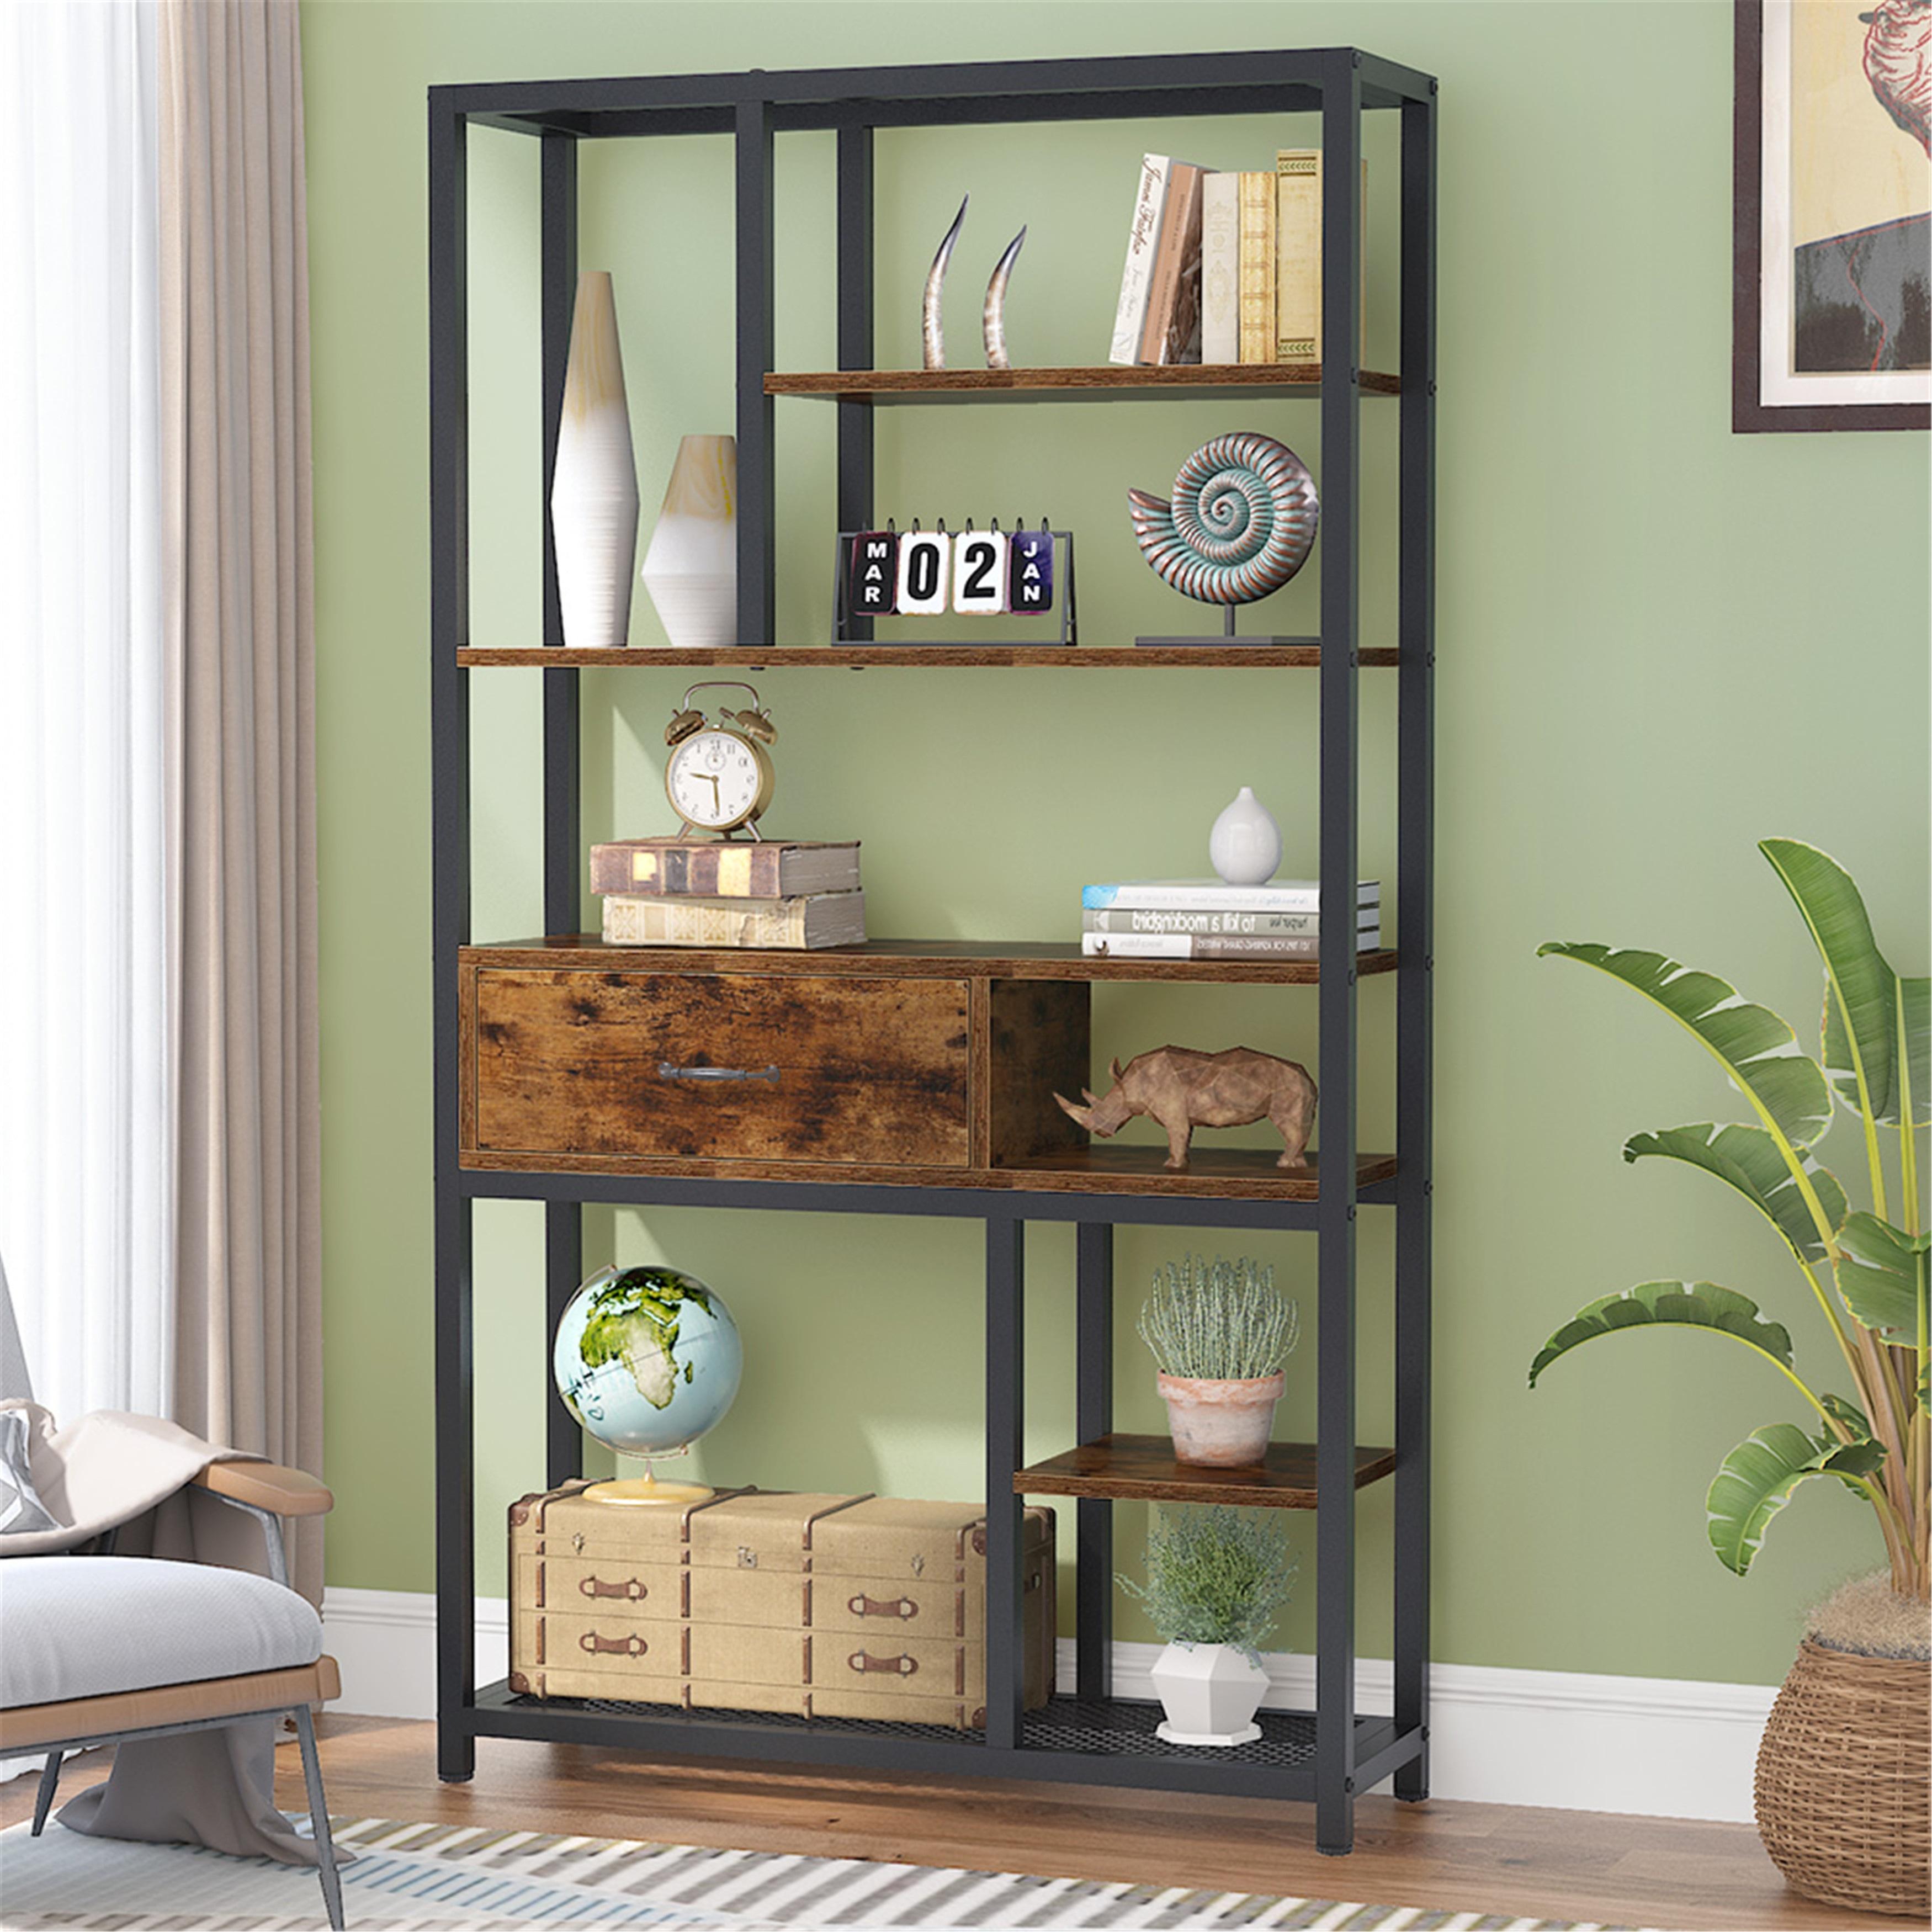 Retro Bookshelf Rustic 8 Tier Display Shelf With Drawers Rustic Brown Overstock 31864566